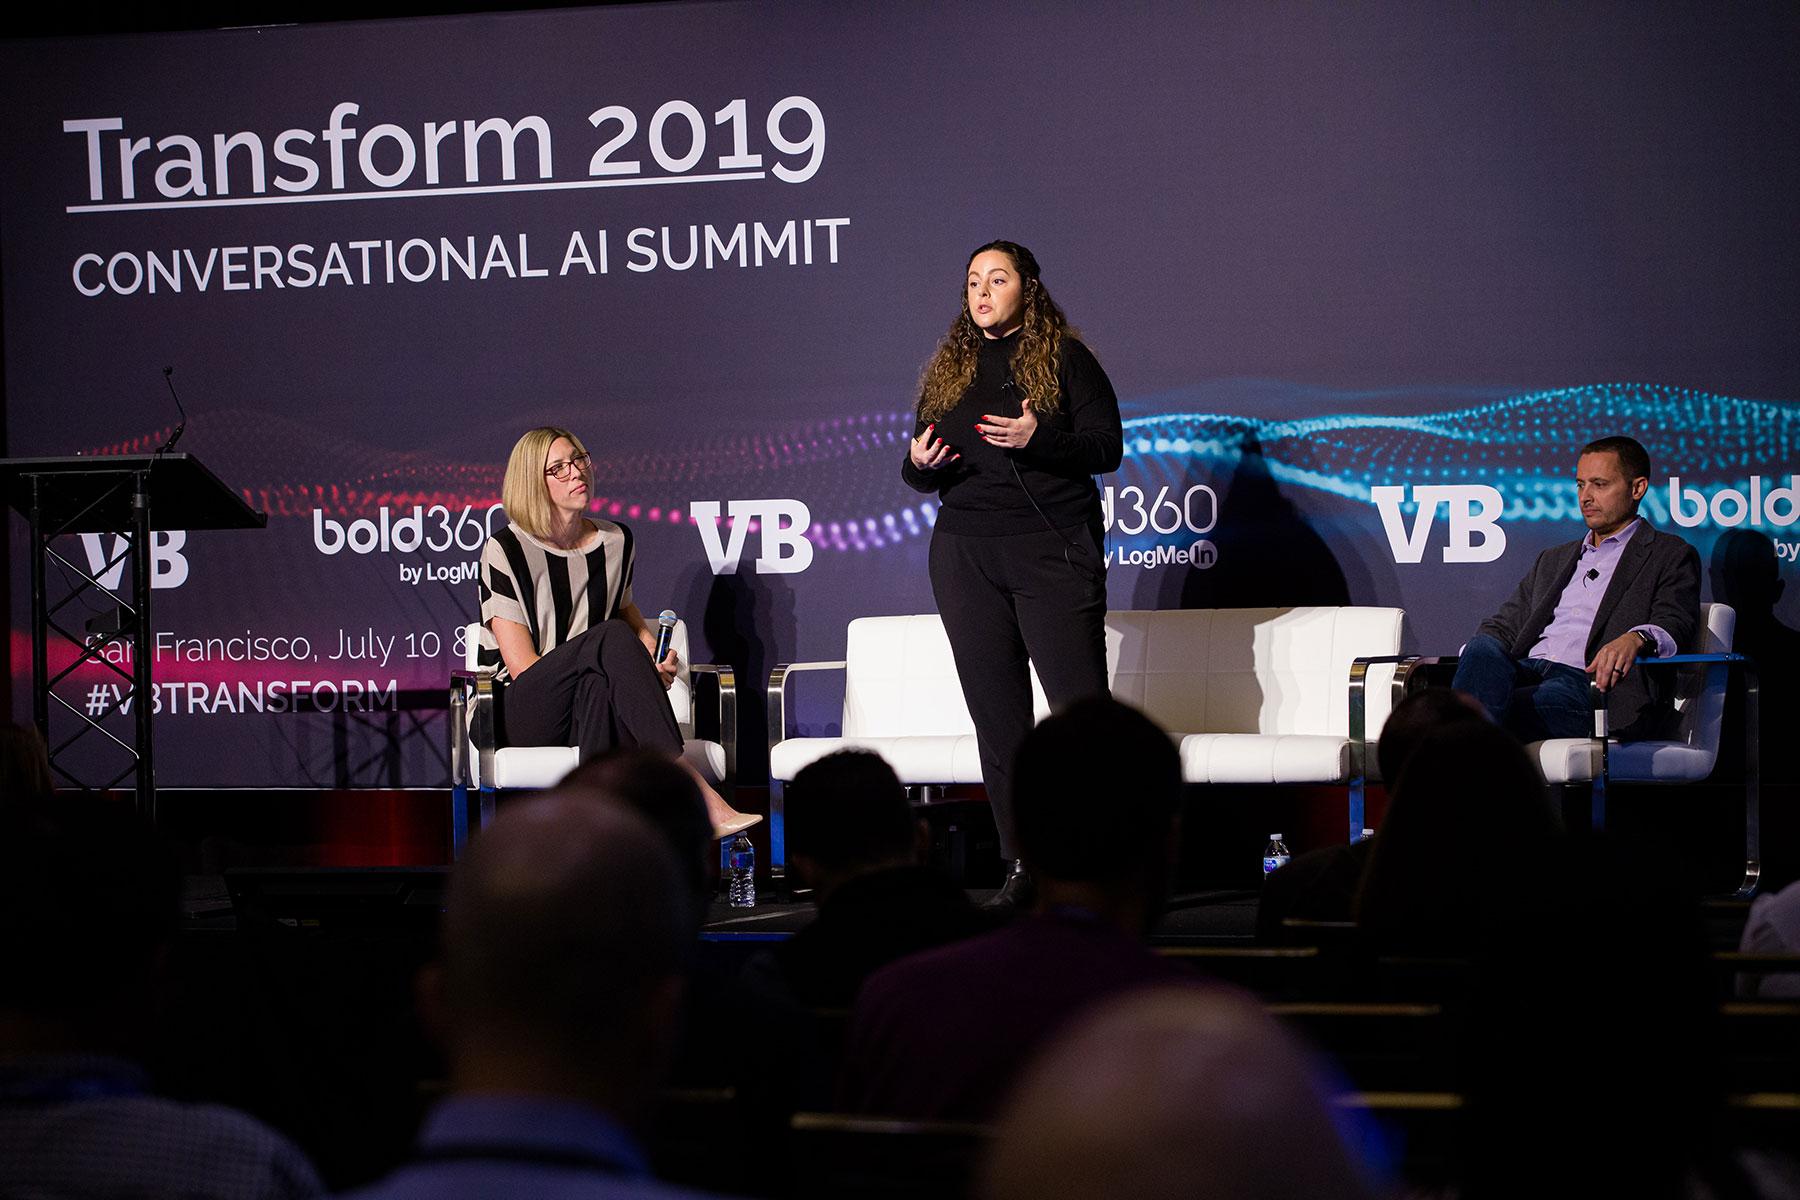 Transform 2019 by VentureBeat